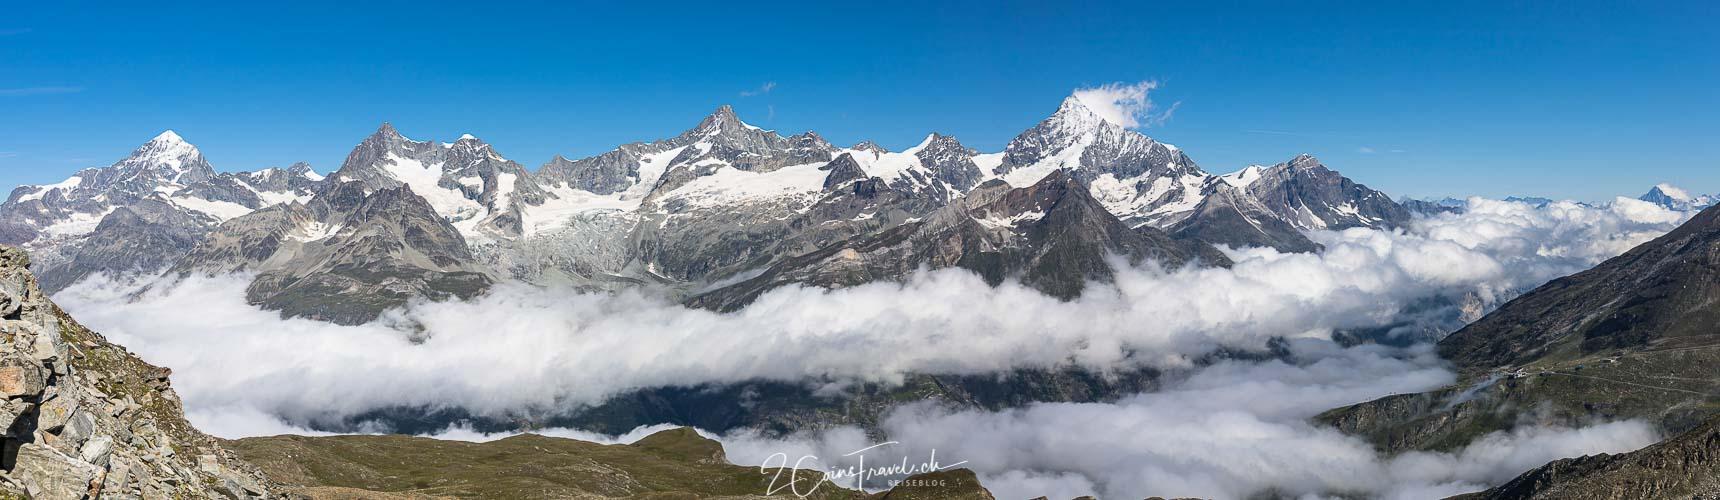 Panorama Zermattertal